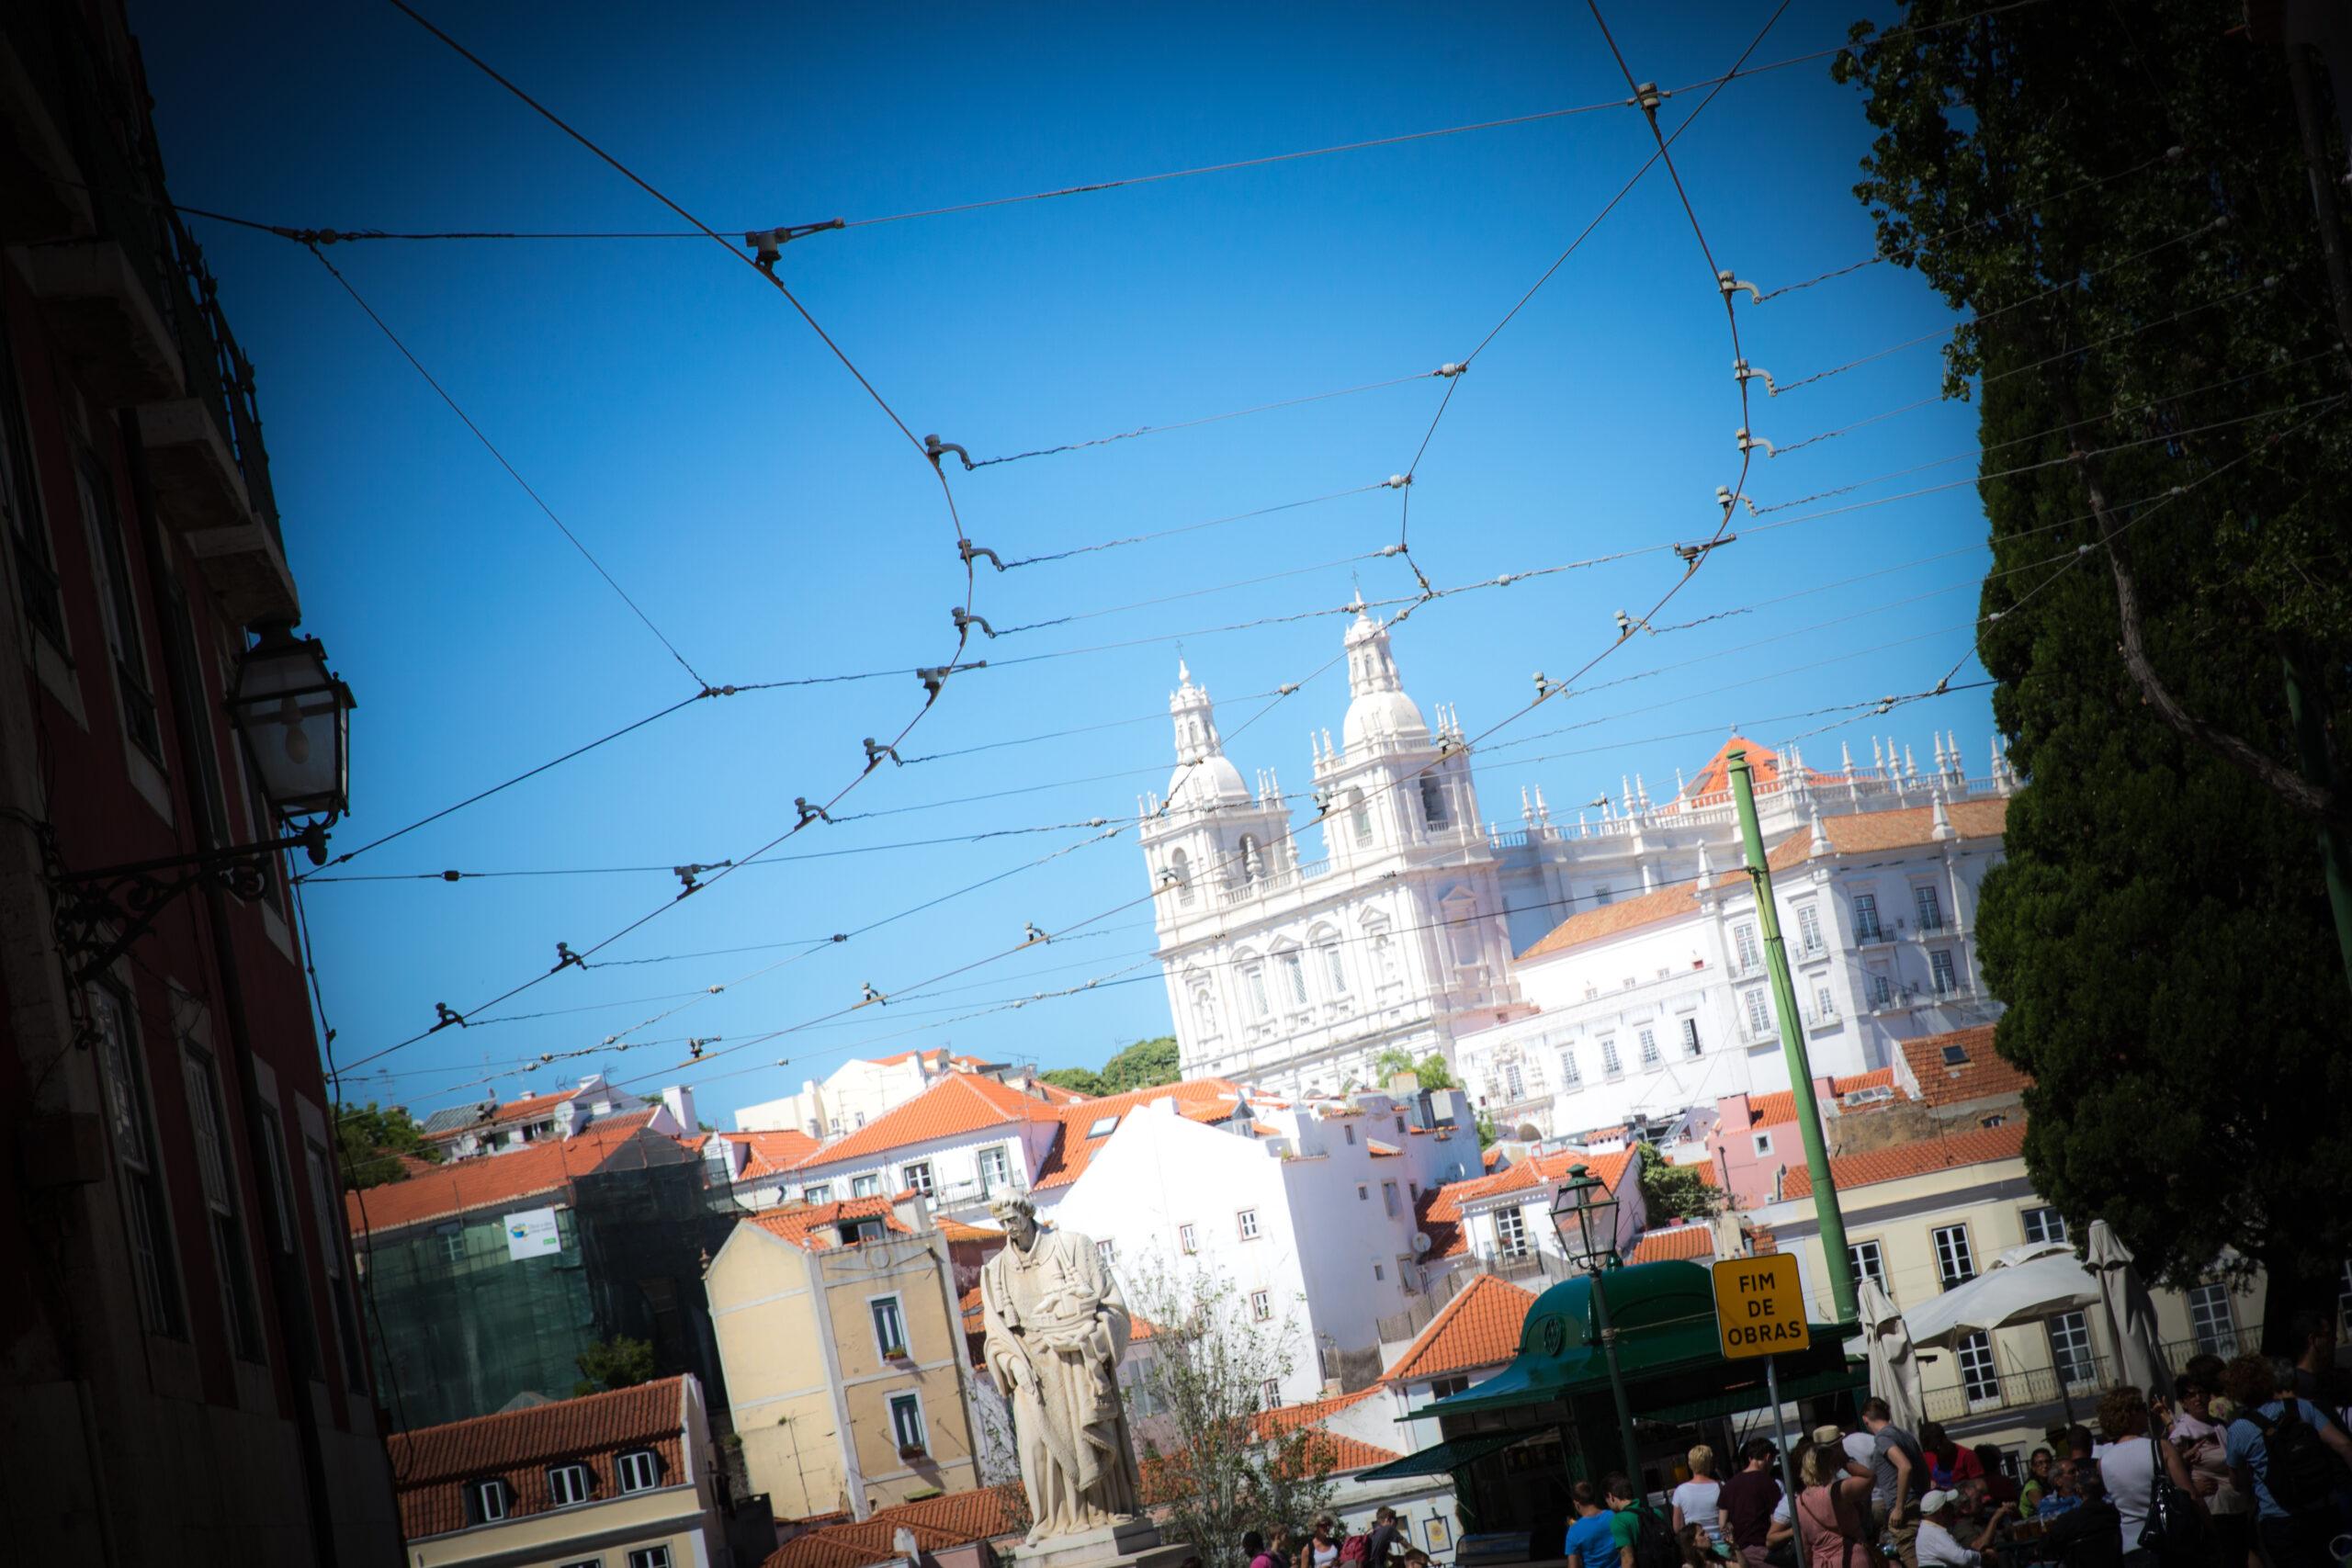 Lisbon Travel | Lisbon Travel Photography | THE PHOTOKITCHEN